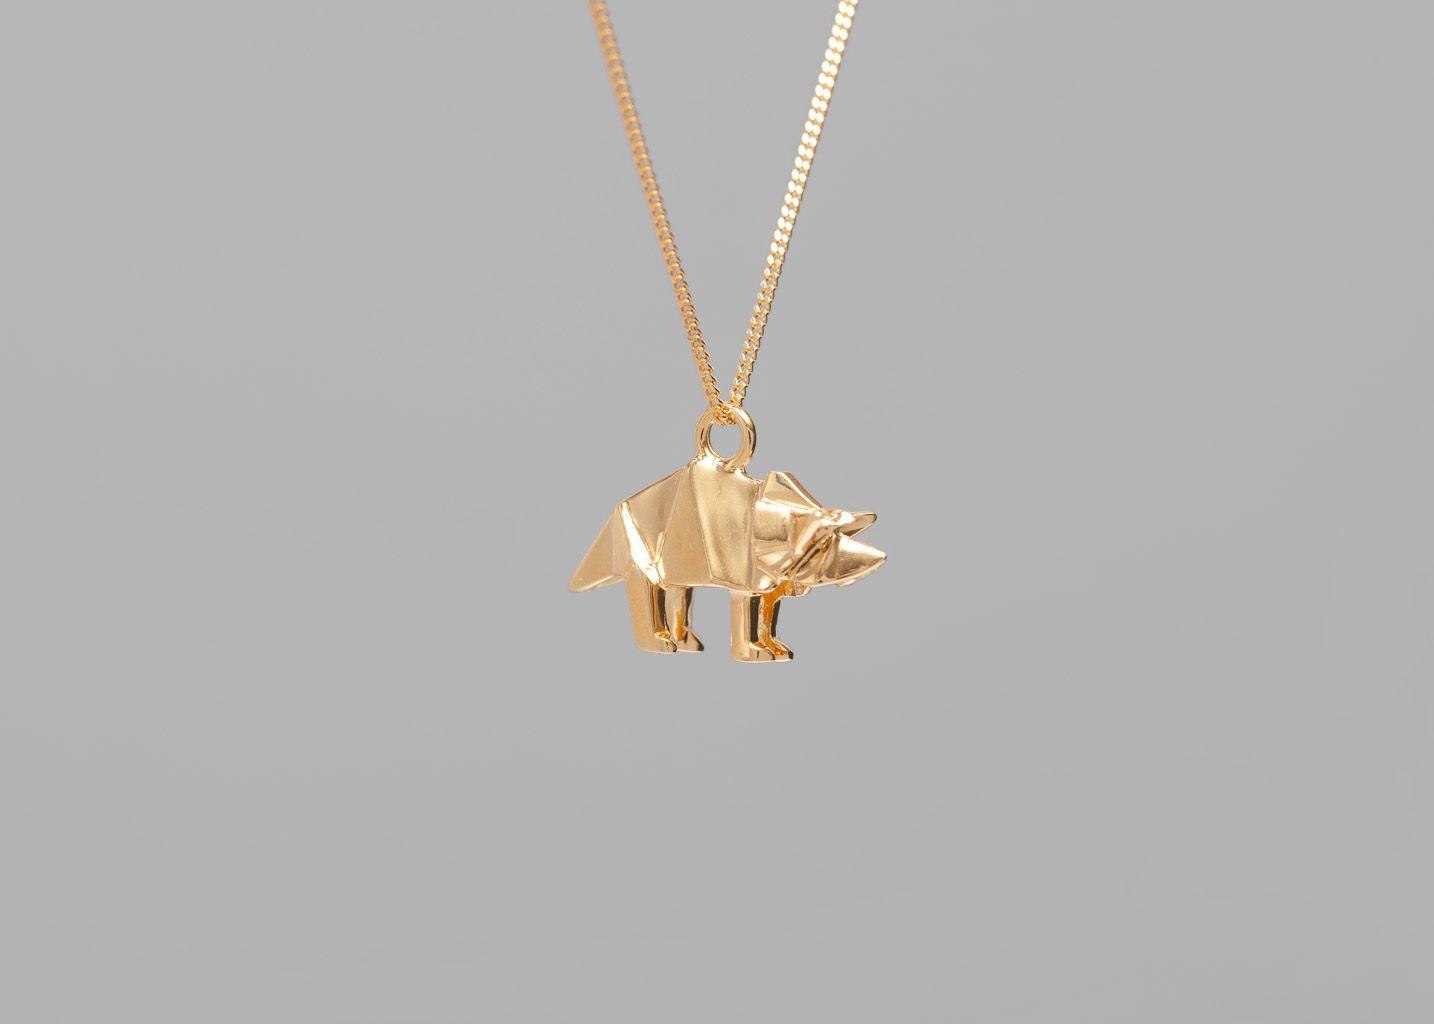 Collier Mini Triceratop - Origami Jewellery